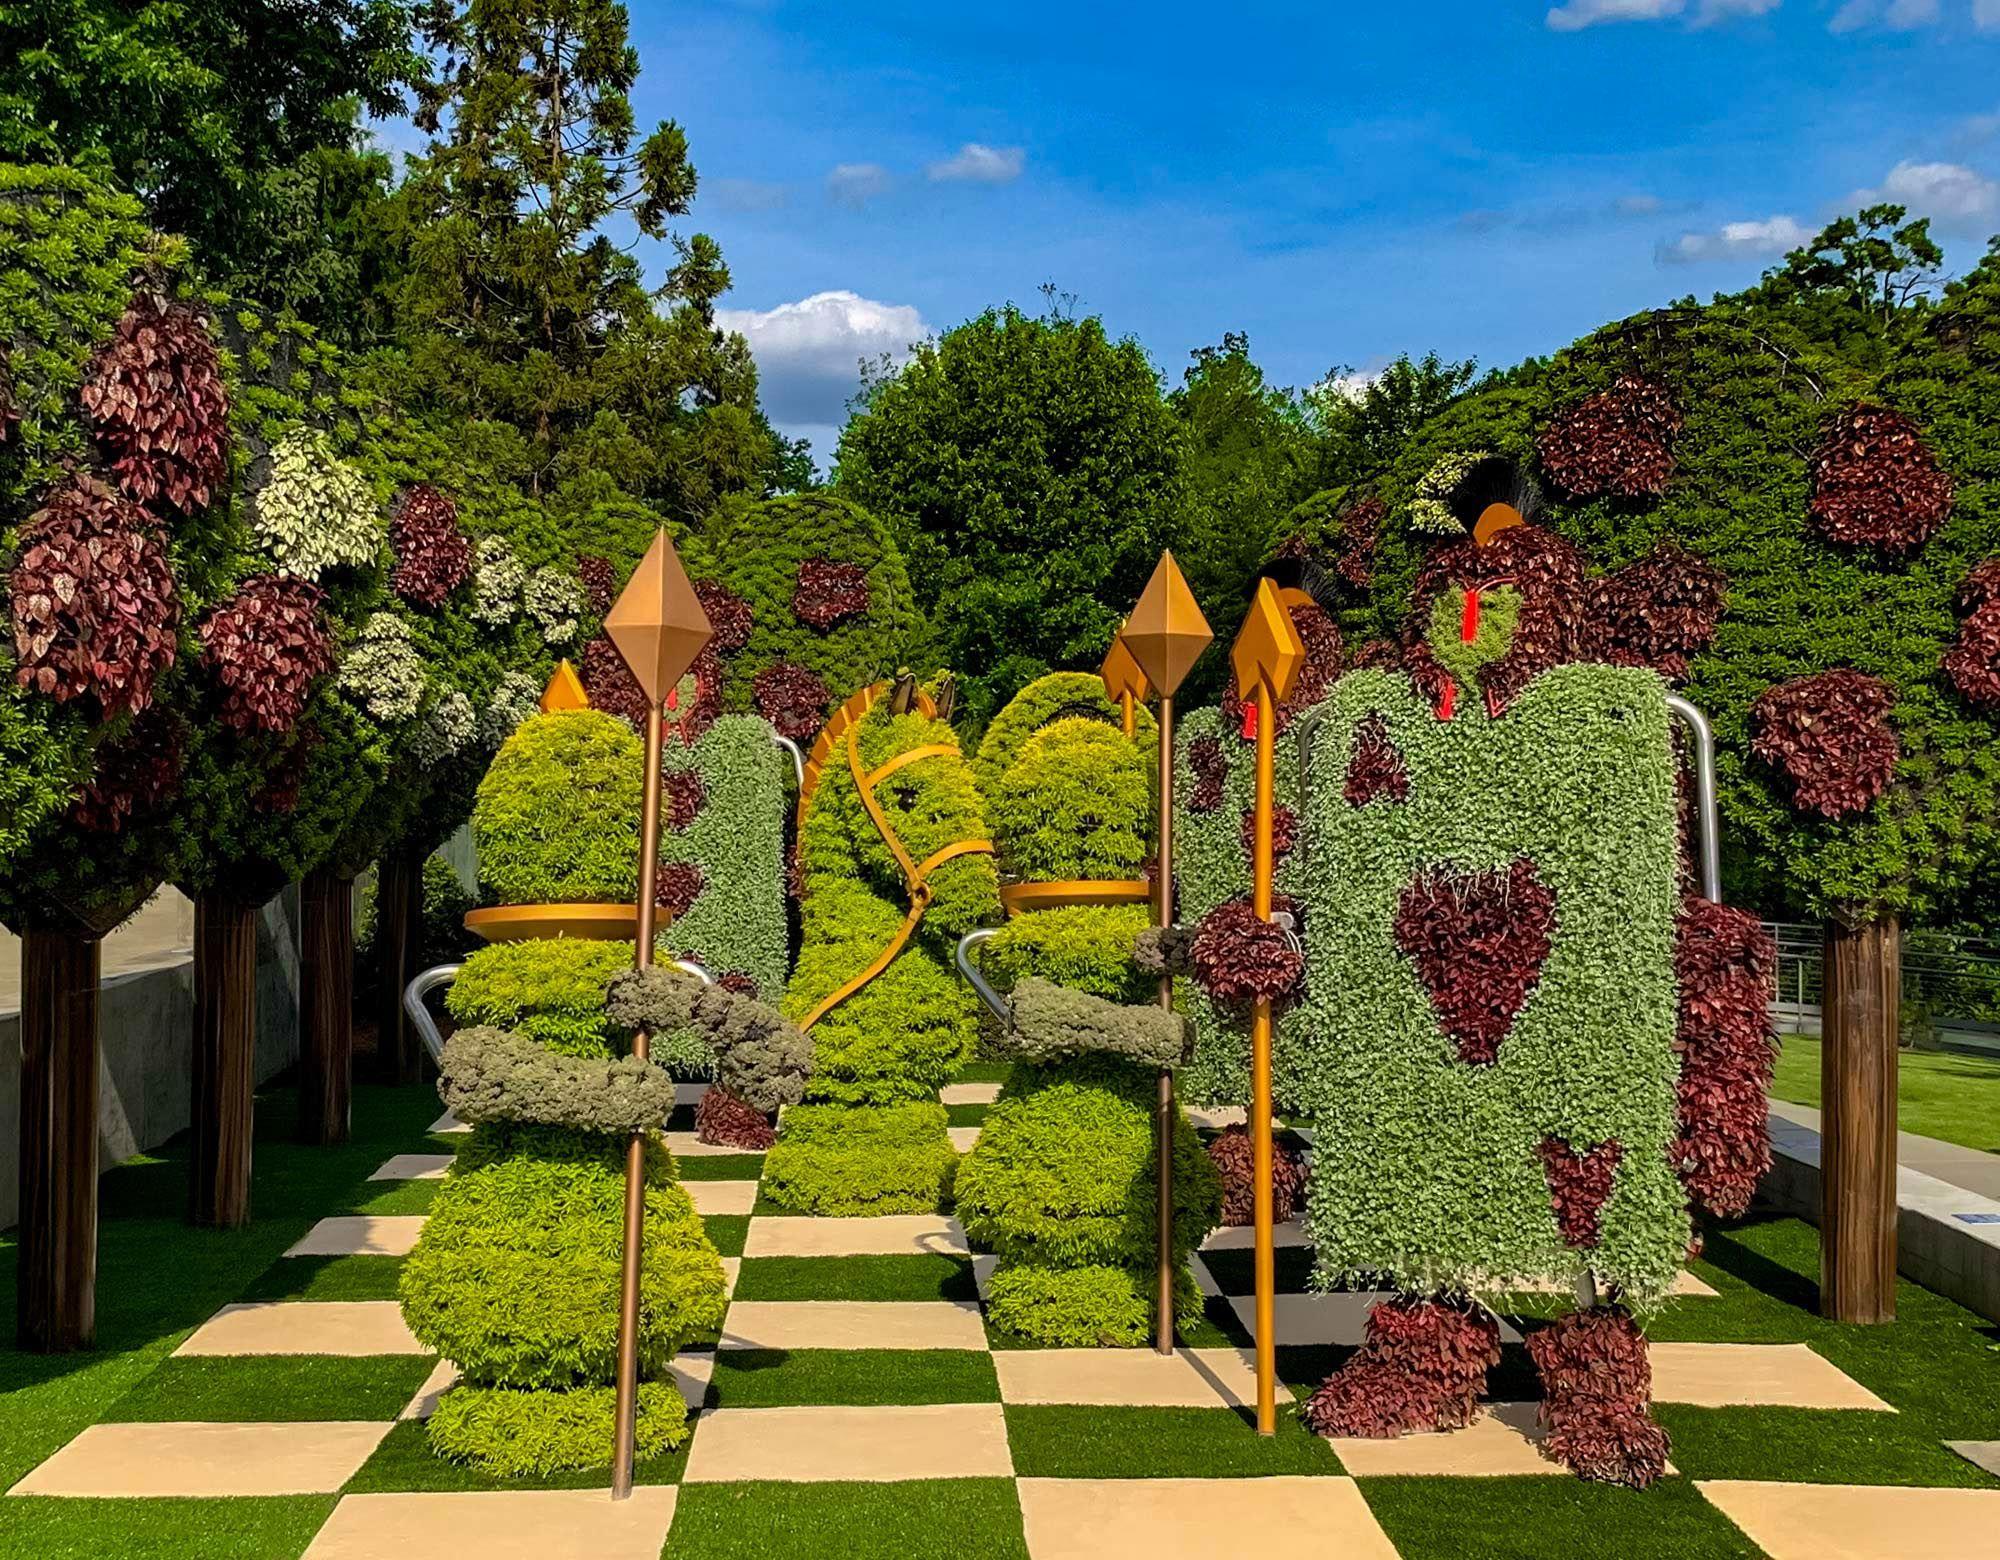 Atlanta Botanical Garden Botanical Gardens in Atlanta